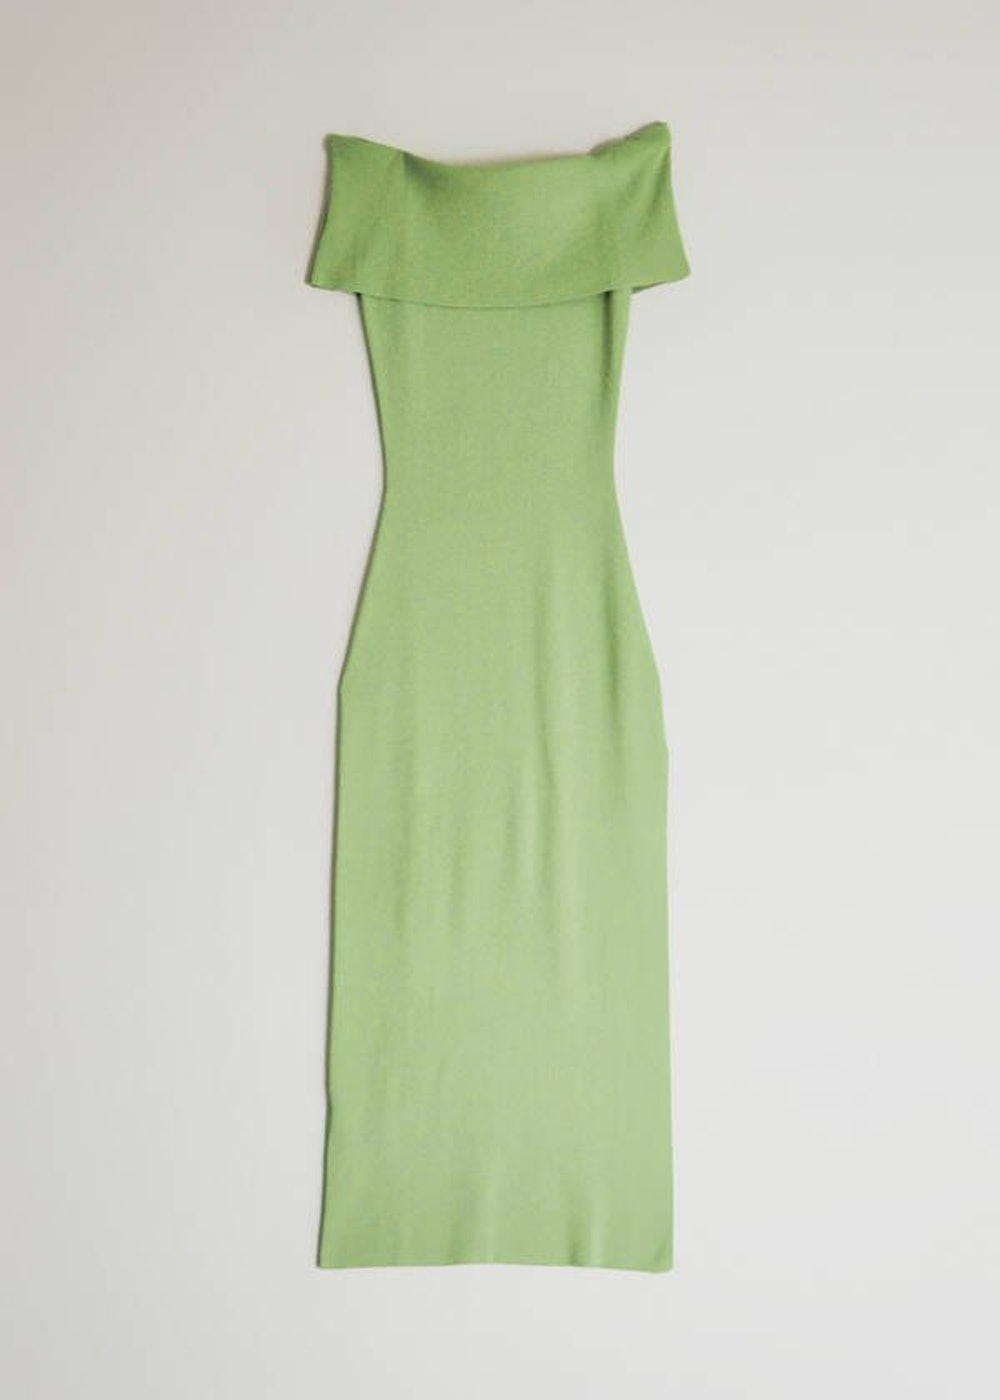 Quepam Knit Dress in Light Olive Green